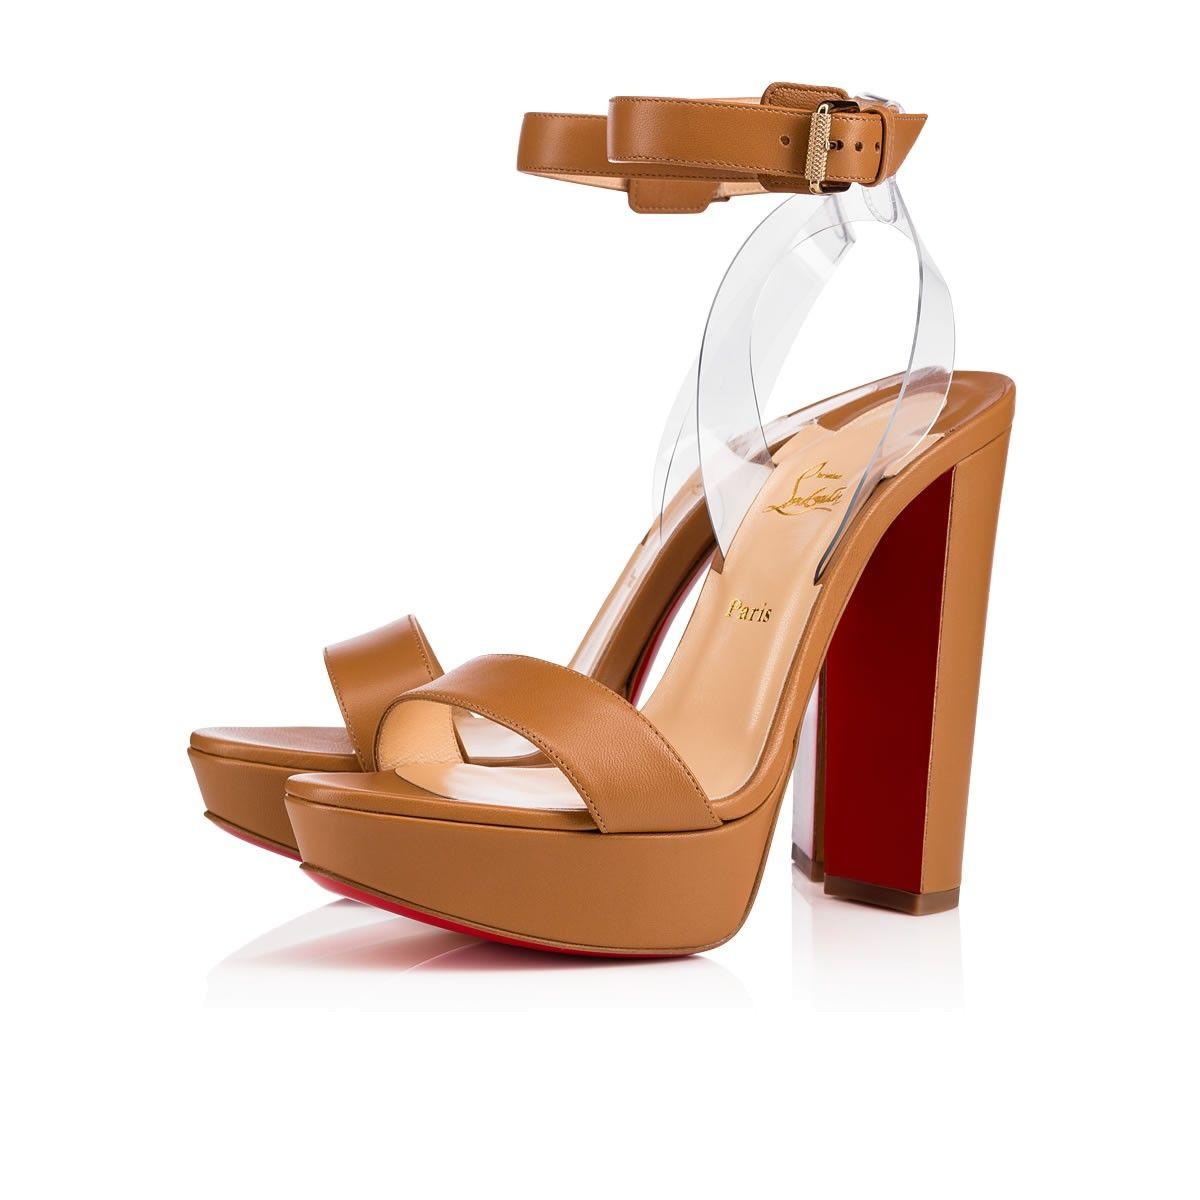 5b2ec14f5035 CHRISTIAN LOUBOUTIN Cherrysandal 140 Nappa Pvc Nappa 140 Nude 4 Nappa -  Women Shoes - Christian Louboutin.  christianlouboutin  shoes